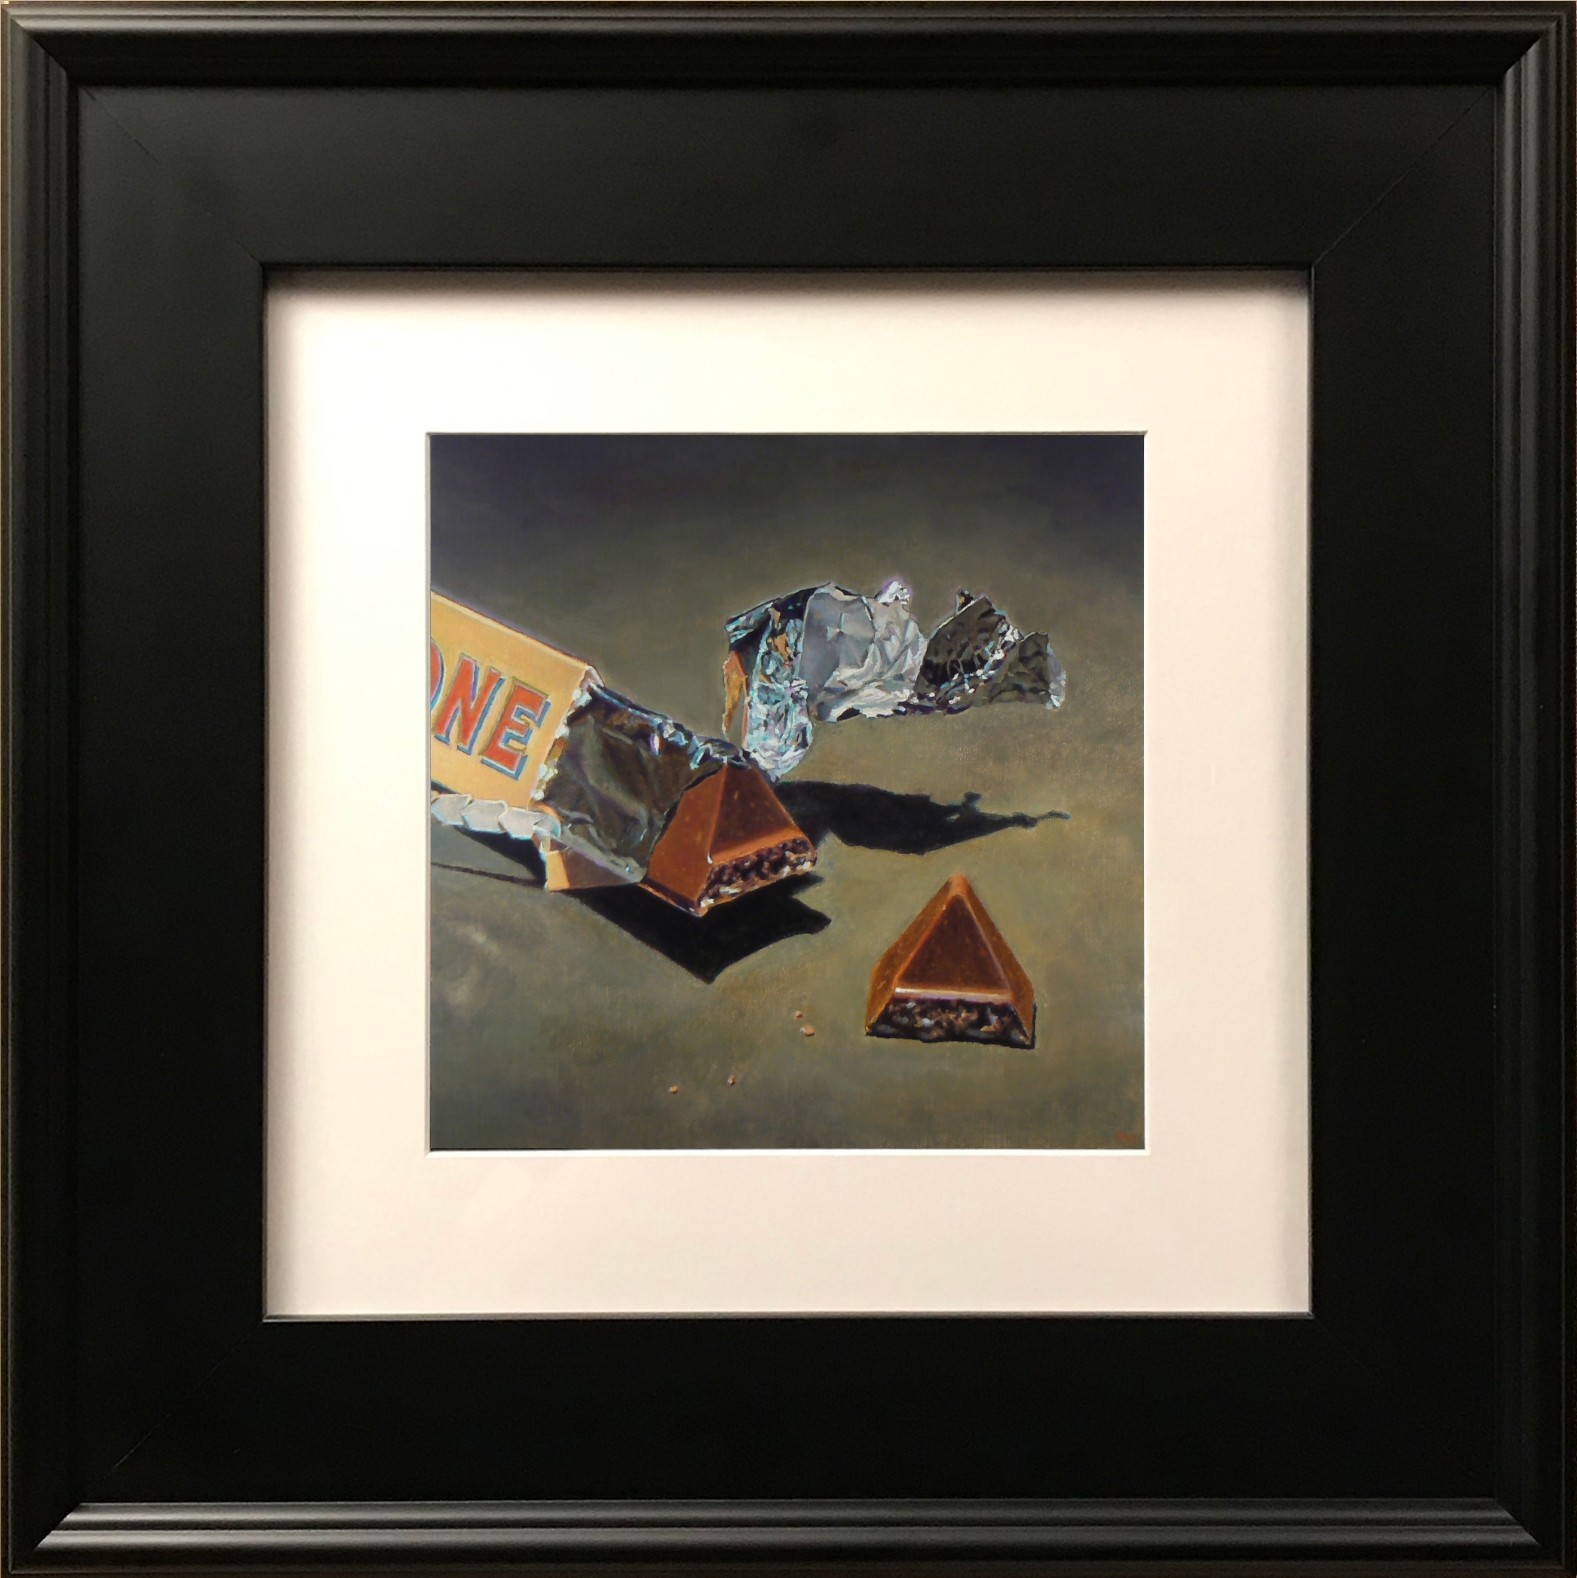 100497-square-print-plein-air-framed-black-cropped